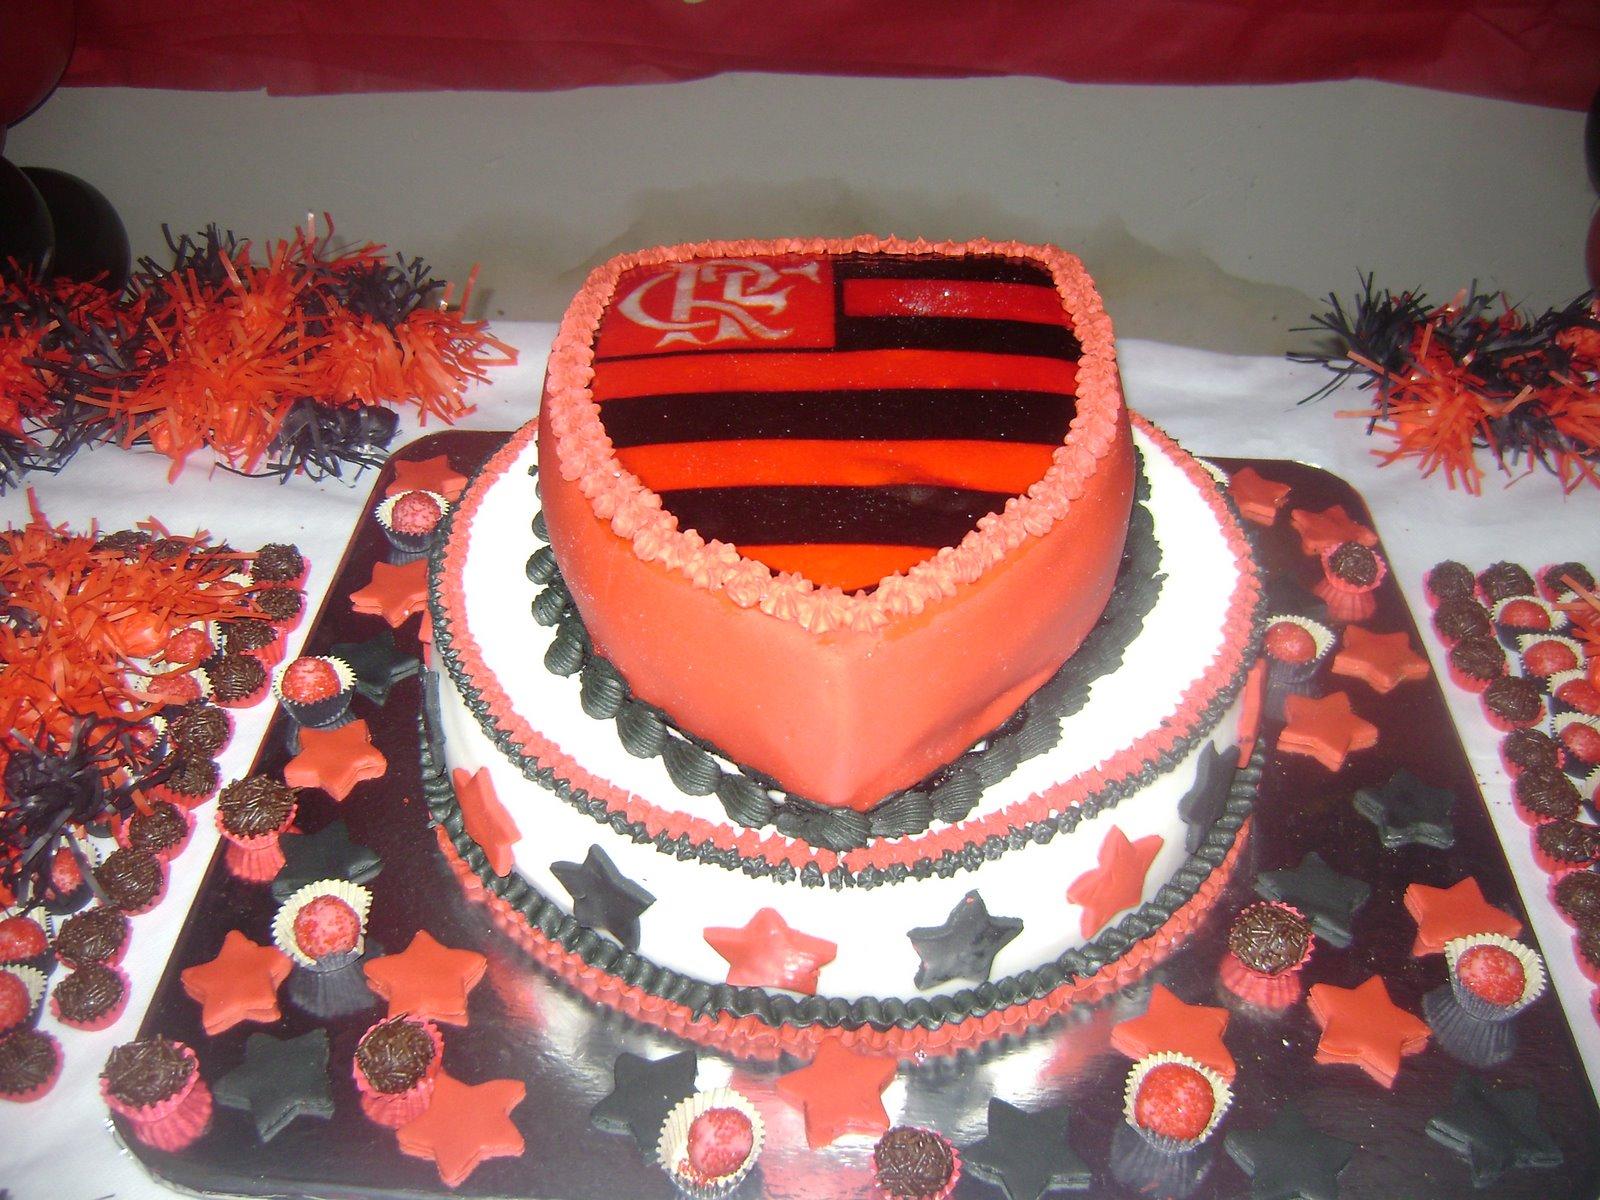 http://1.bp.blogspot.com/_NyTd-Jc4De0/Sw6IELUEGmI/AAAAAAAAAv4/7qGoTDv6avA/s1600/Bolo+Flamengo.jpg